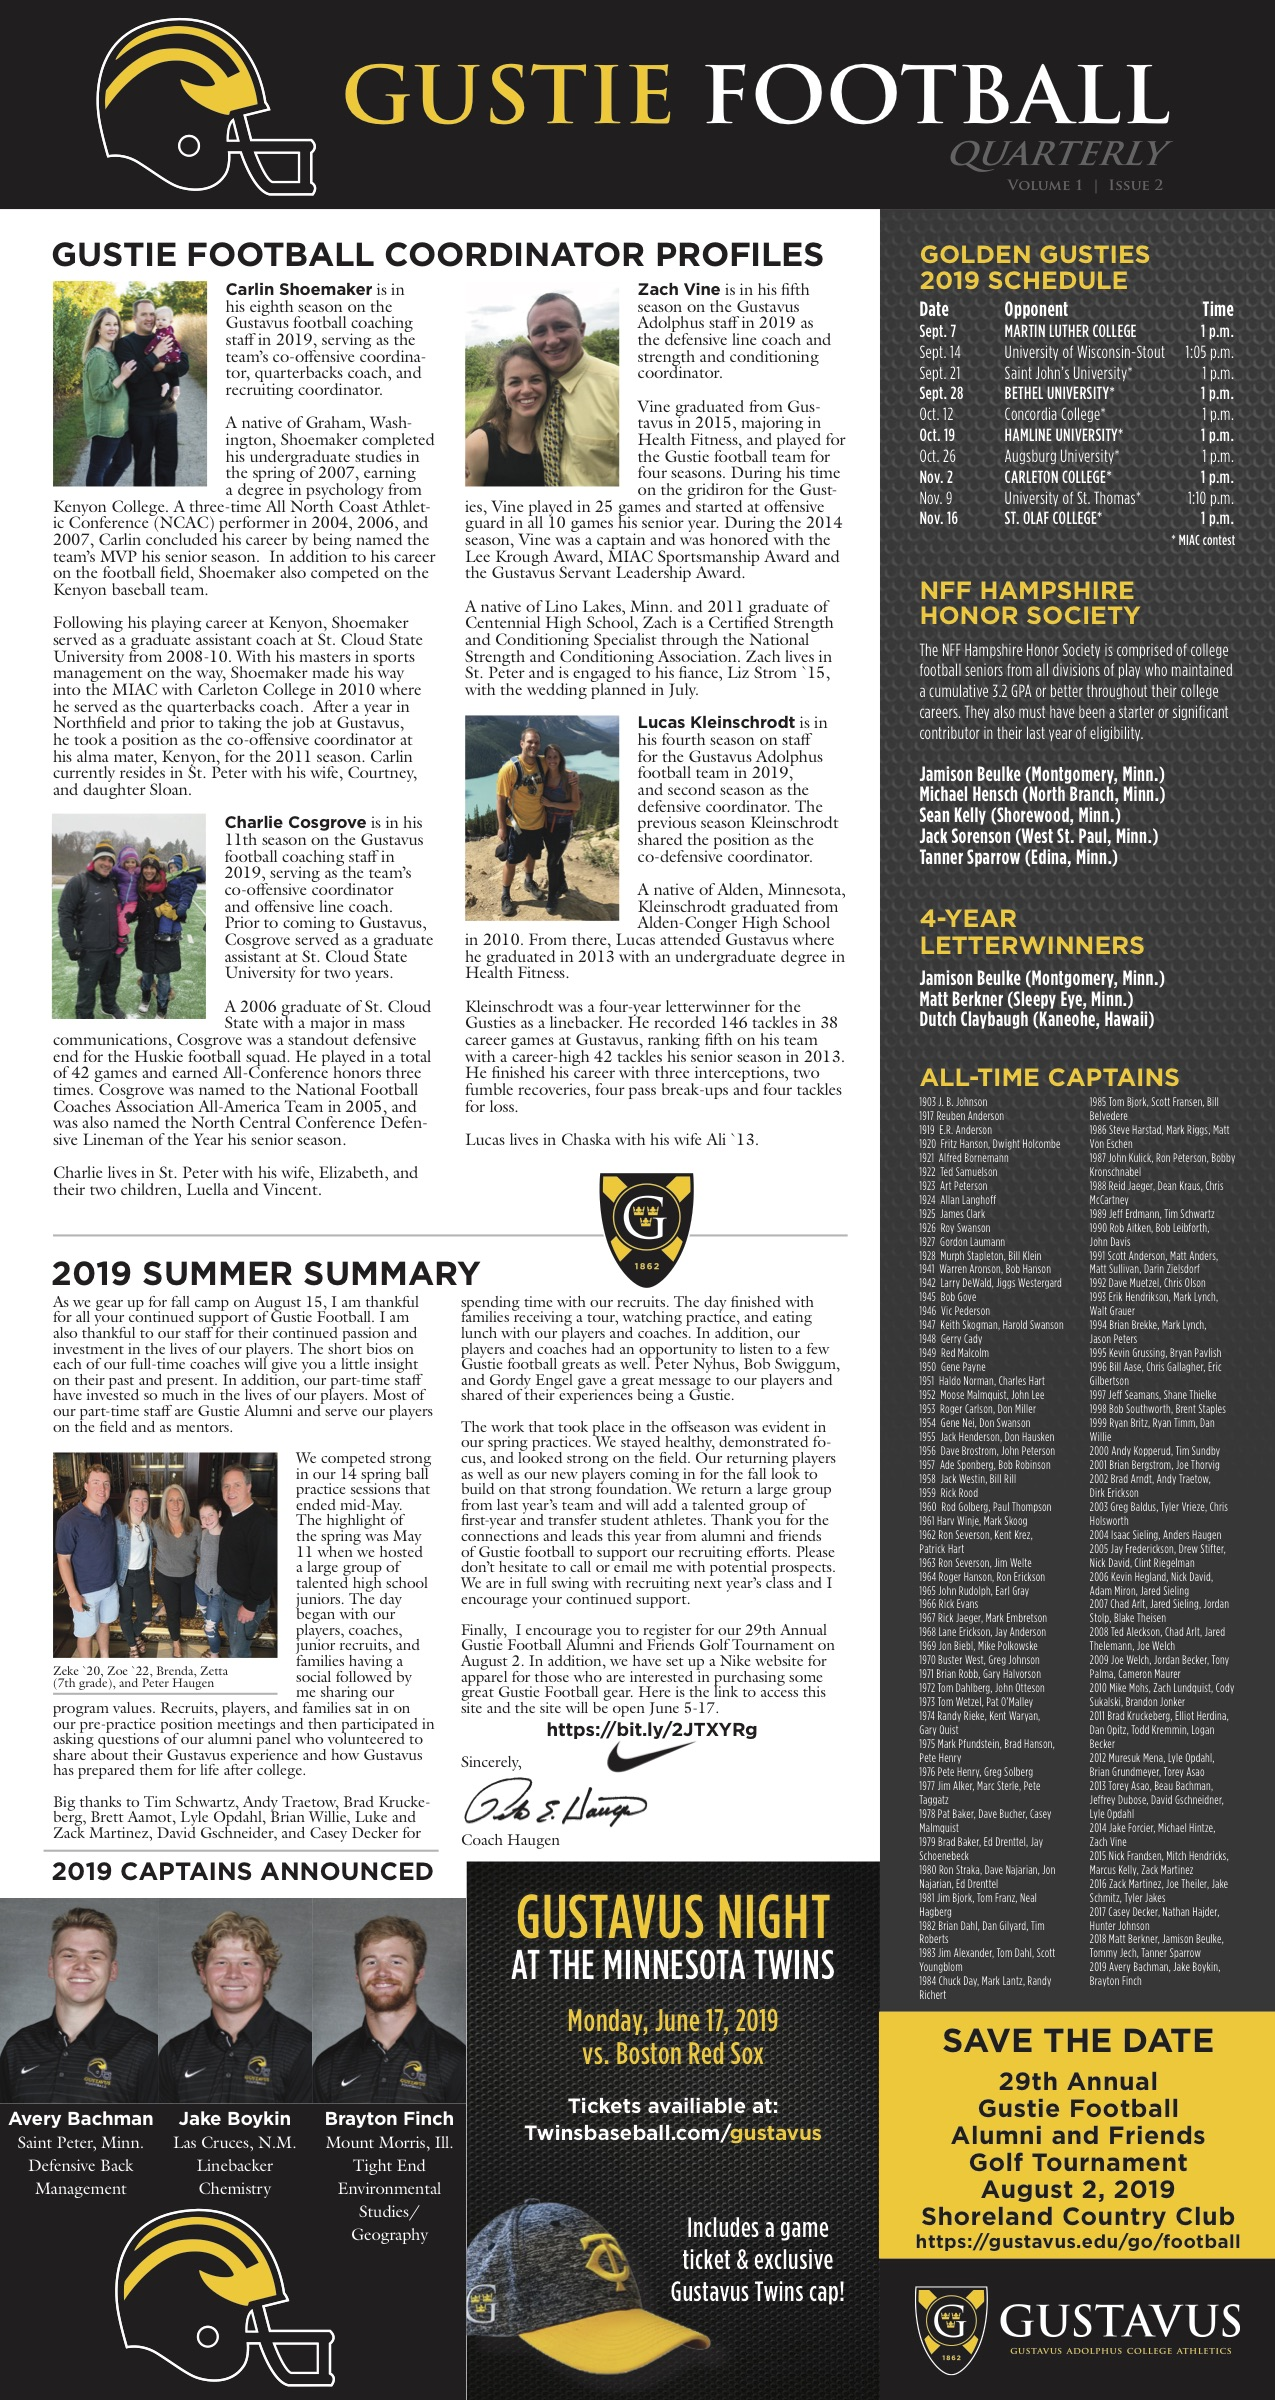 Football Quarterly Newsletter – Summer Update - Posted on June 7th